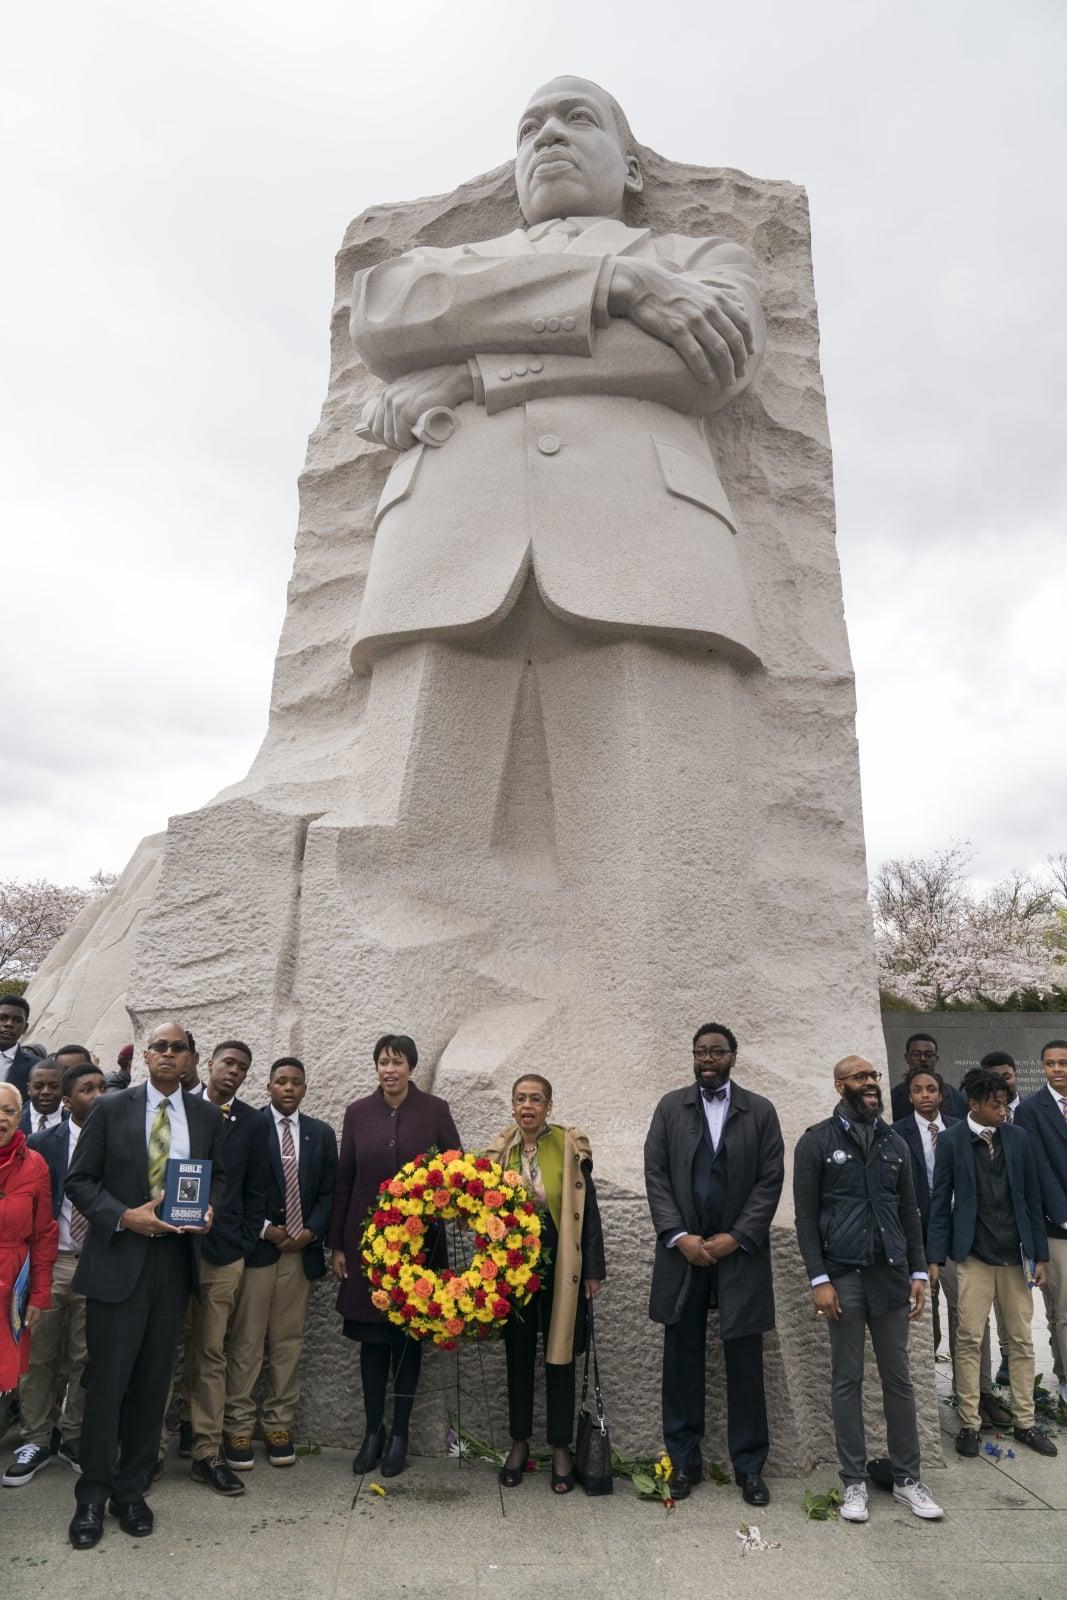 Rocznica zabójstwa Martina Luthera Kinga fot. EPA/JIM LO SCALZO